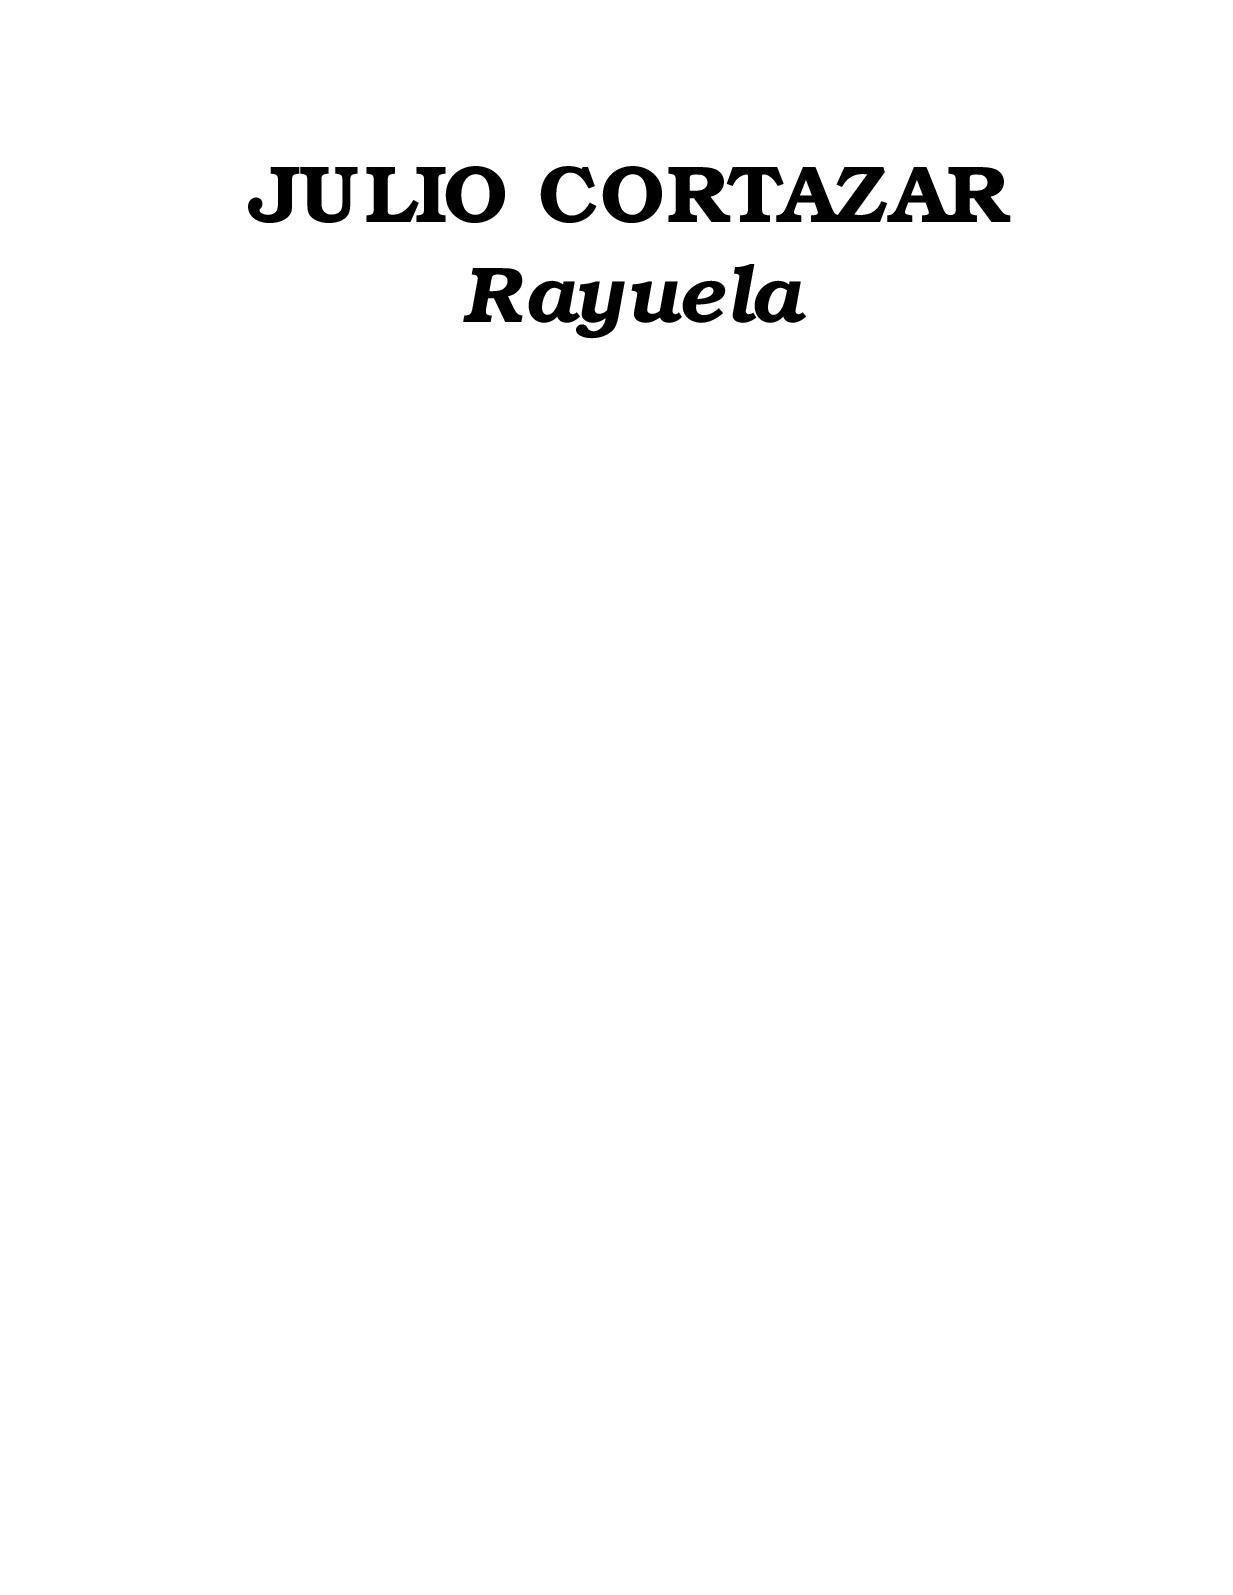 Oro Tono Lat/ón Jesucristo Decoraci/ón de mesa Estatua Hecho a mano Oficina de tablero de instrumentos de coches Estatuilla